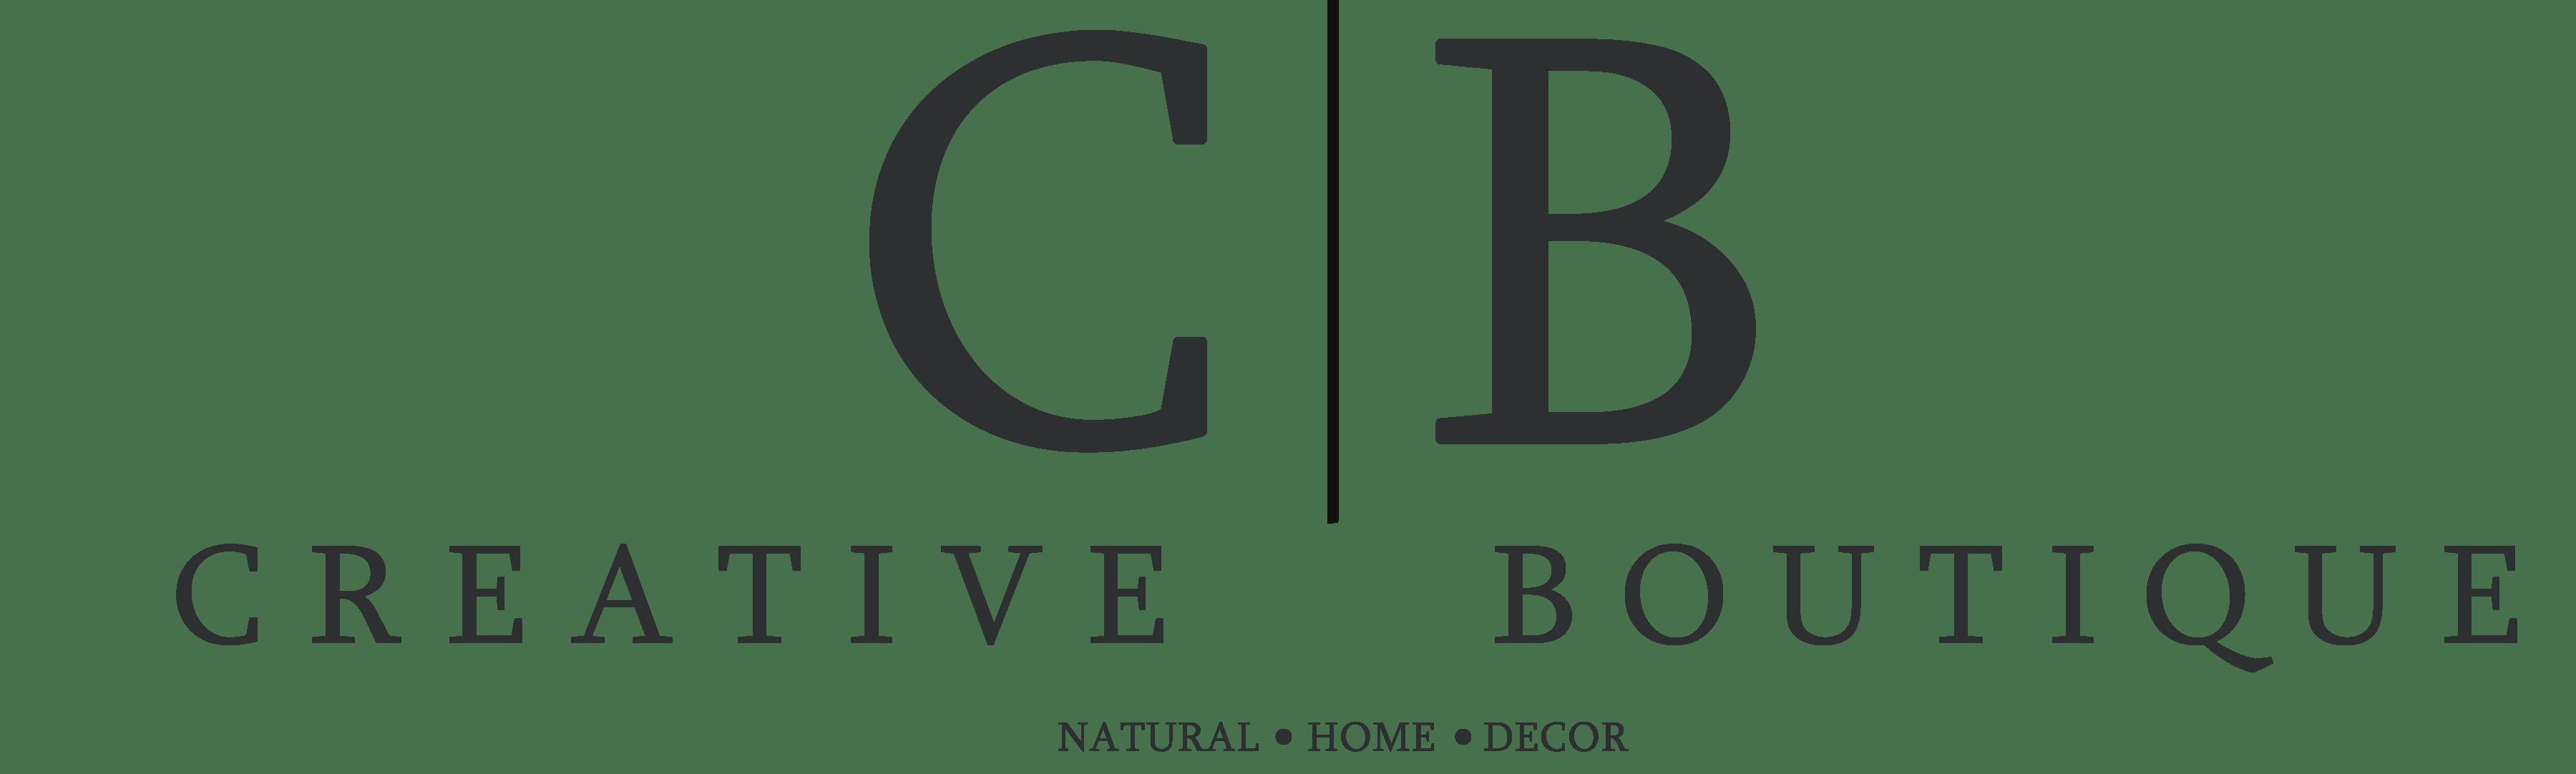 Creative Boutique Store